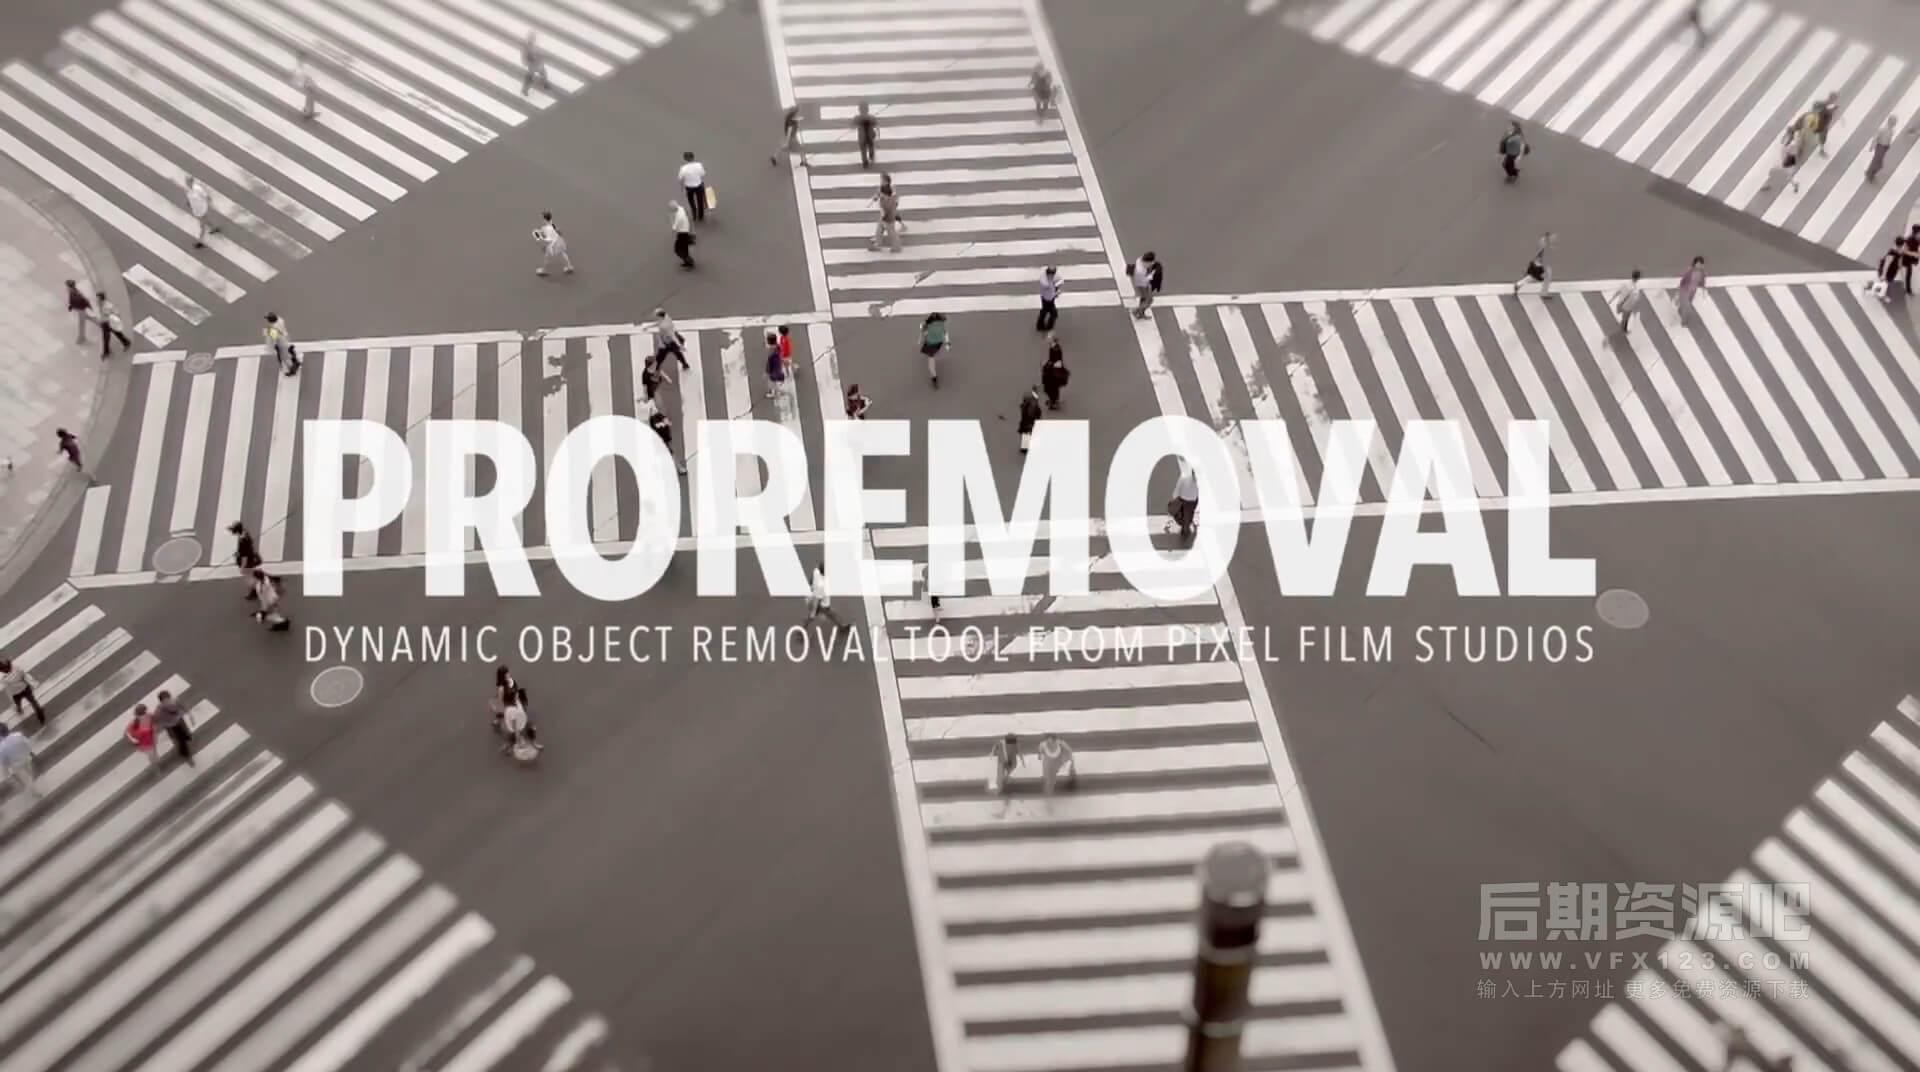 FCPX插件 图像动态移除局部动画展示 ProRemoval +使用教程